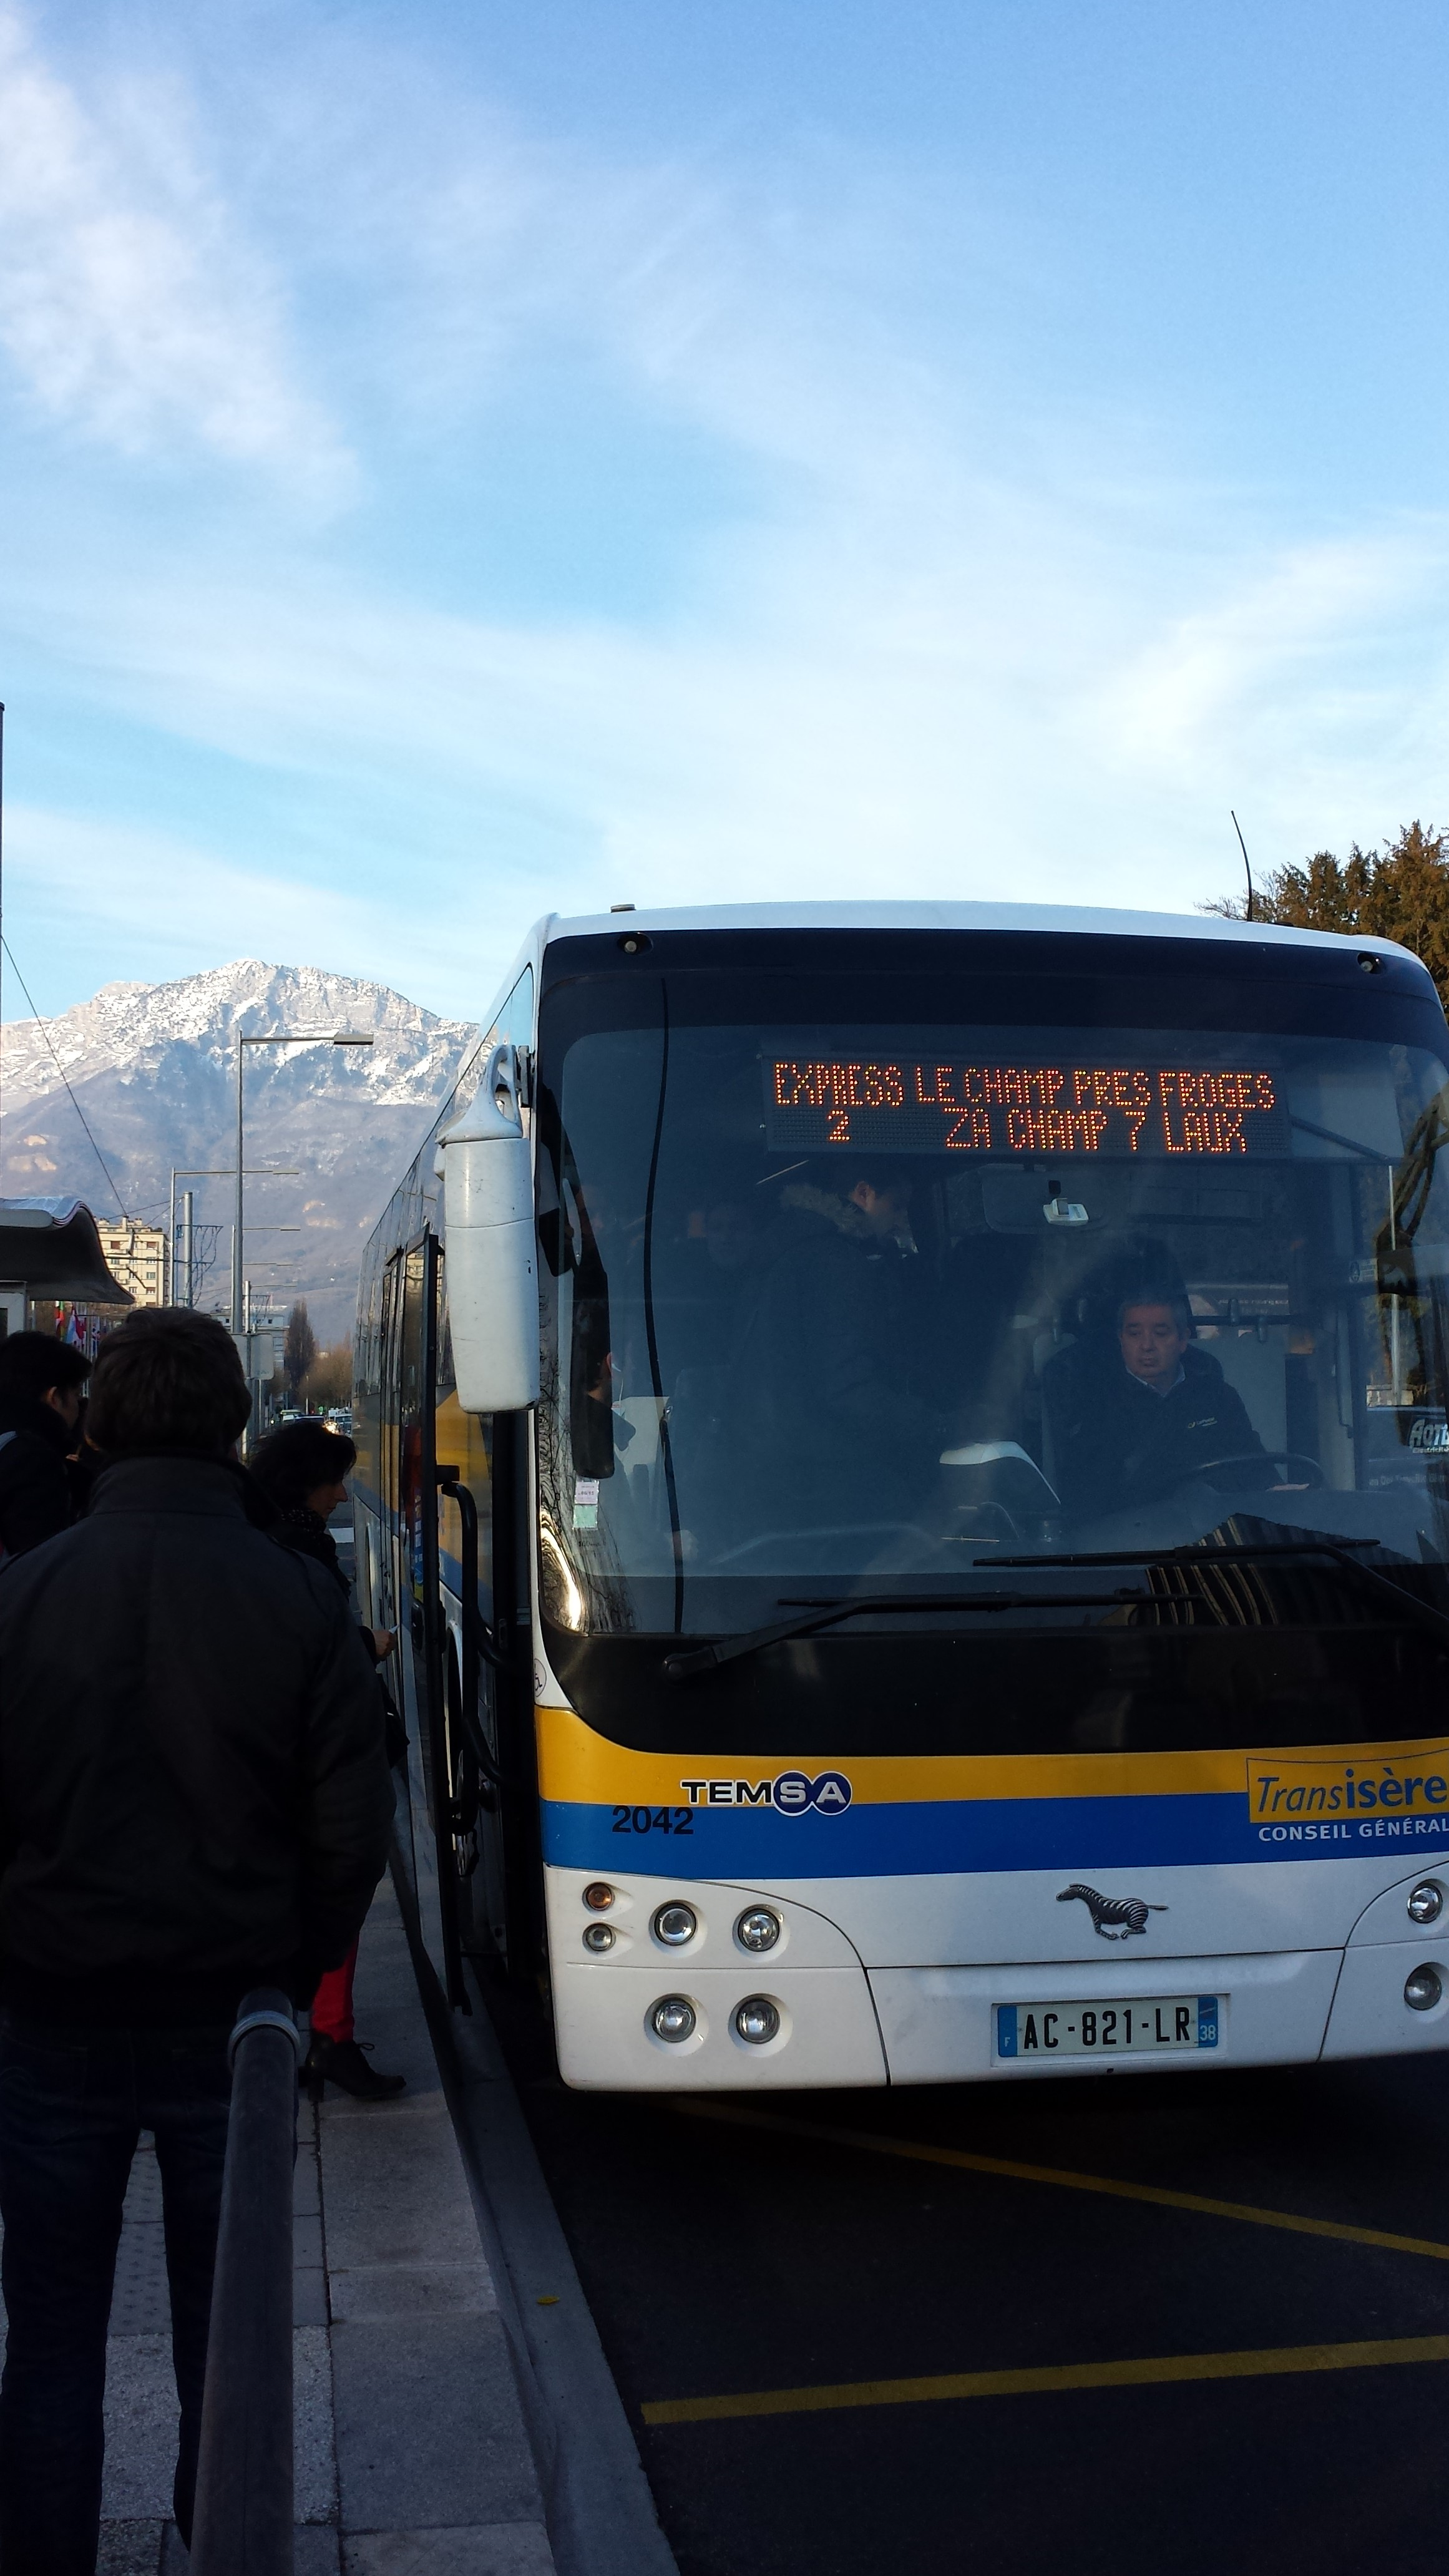 Transisère express2